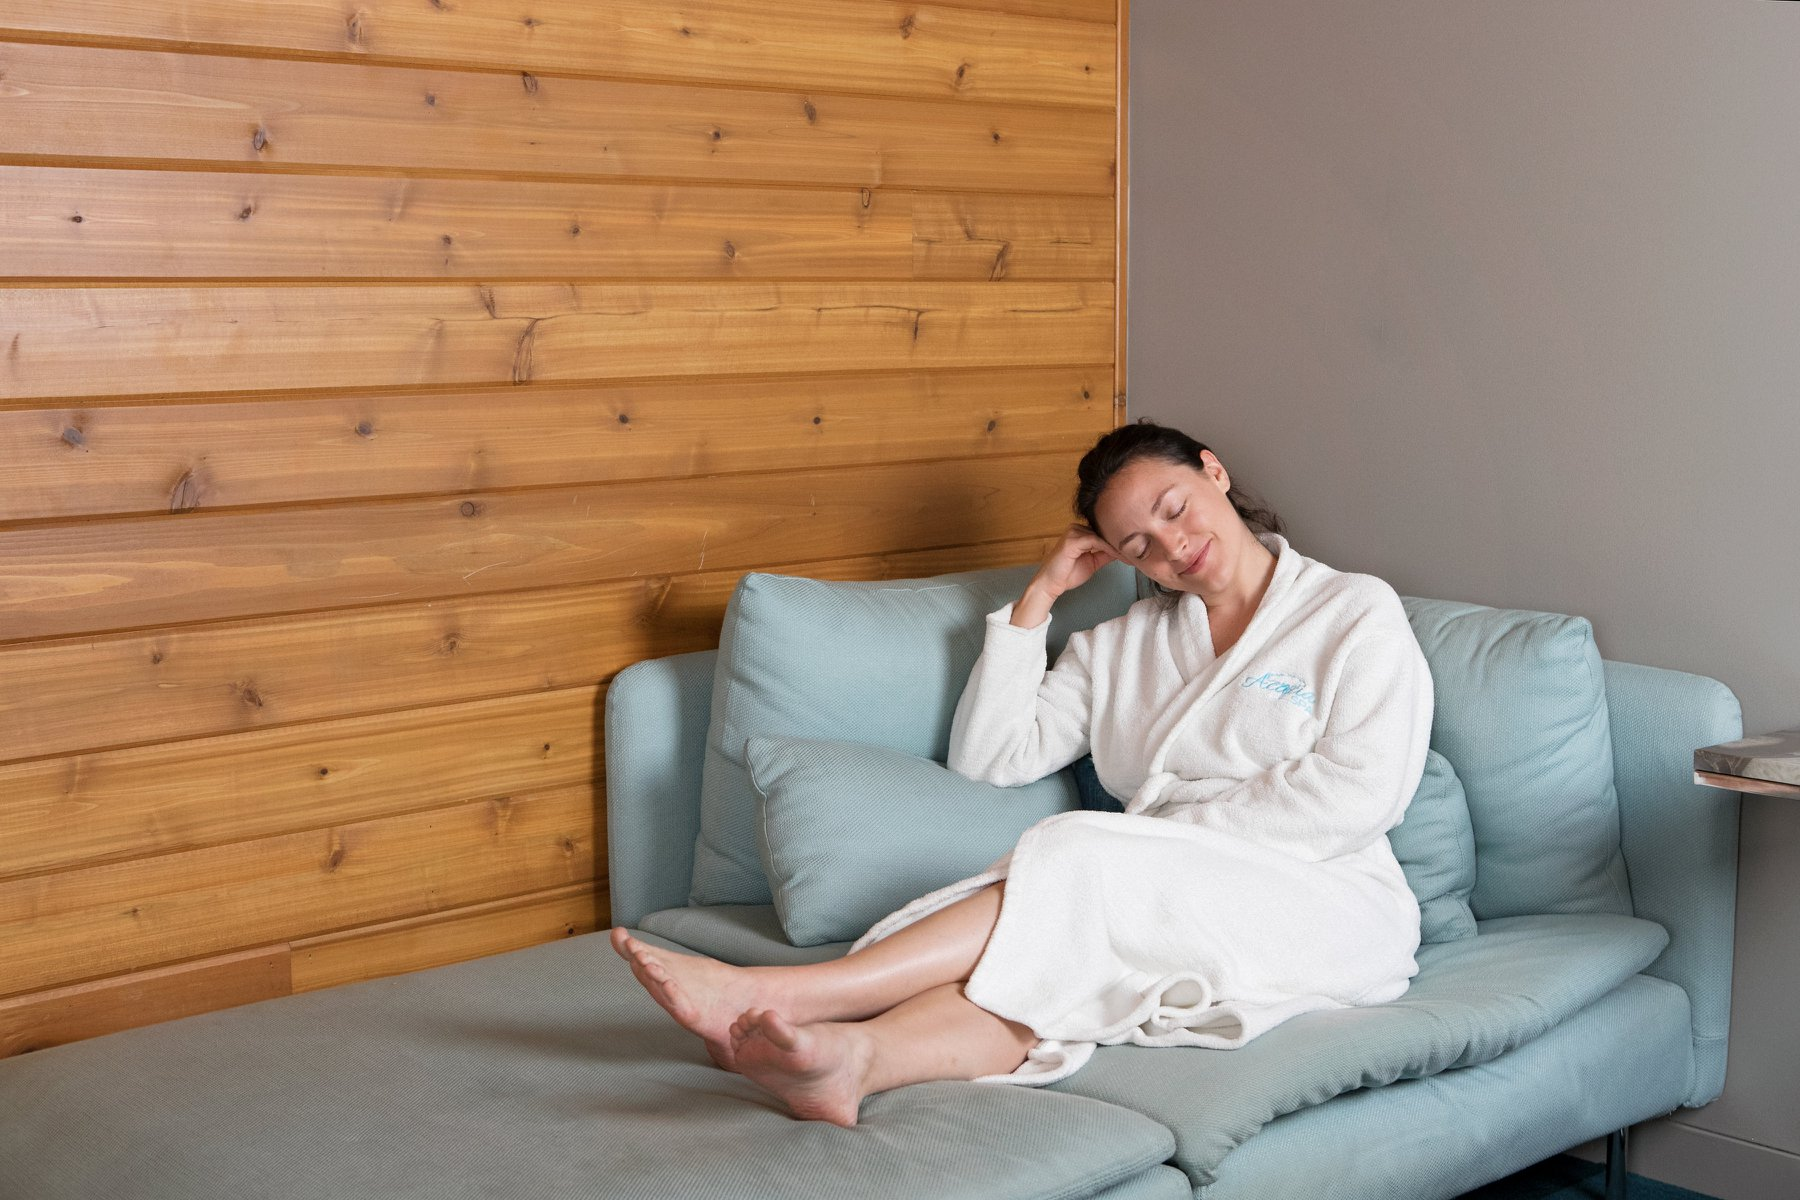 acacia spa springfield missouri woman relaxing robe